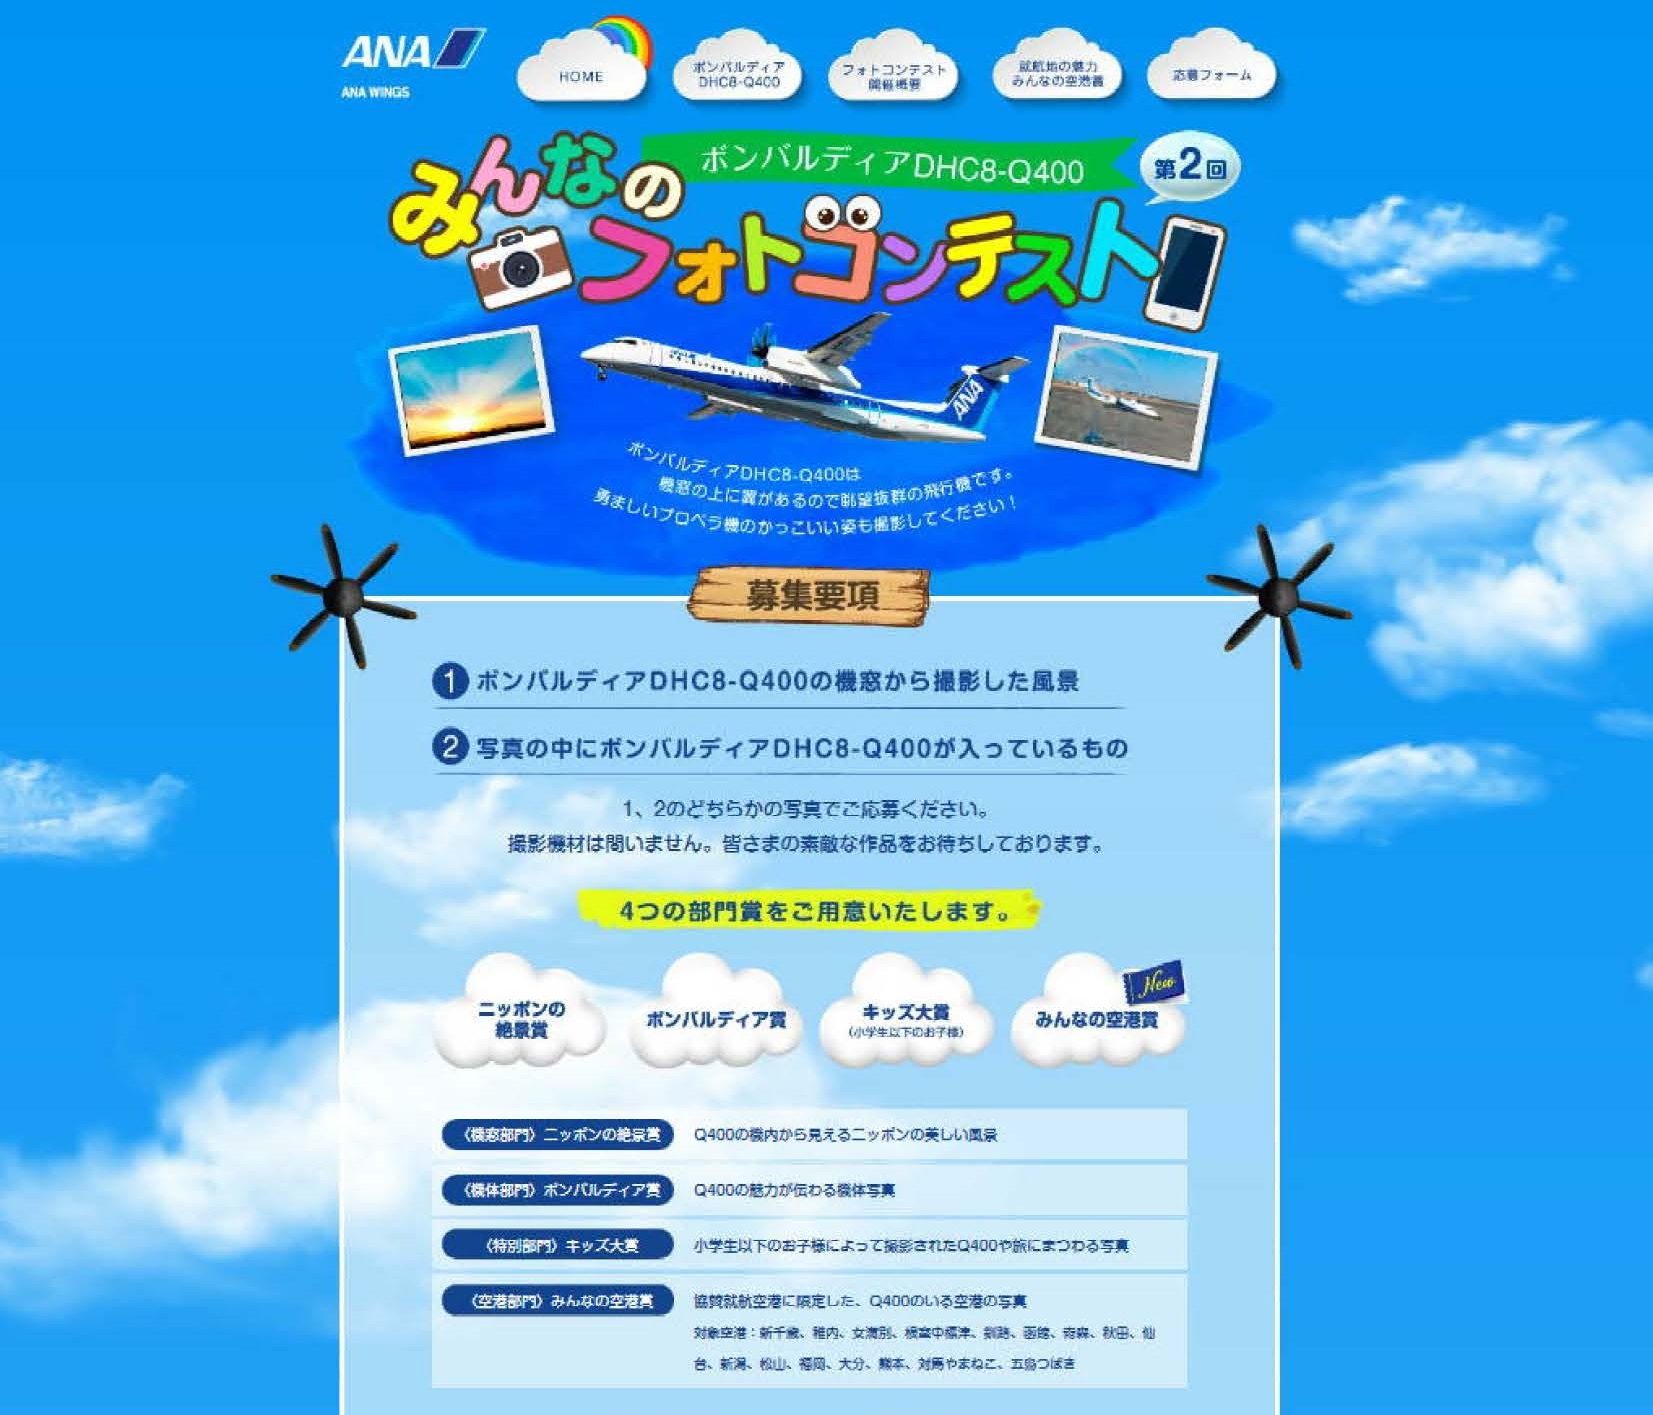 http://www.nakashibetsu-airport.jp/DHC%EF%BE%8C%EF%BD%AB%EF%BE%84%EF%BD%BA%EF%BE%9D.jpg